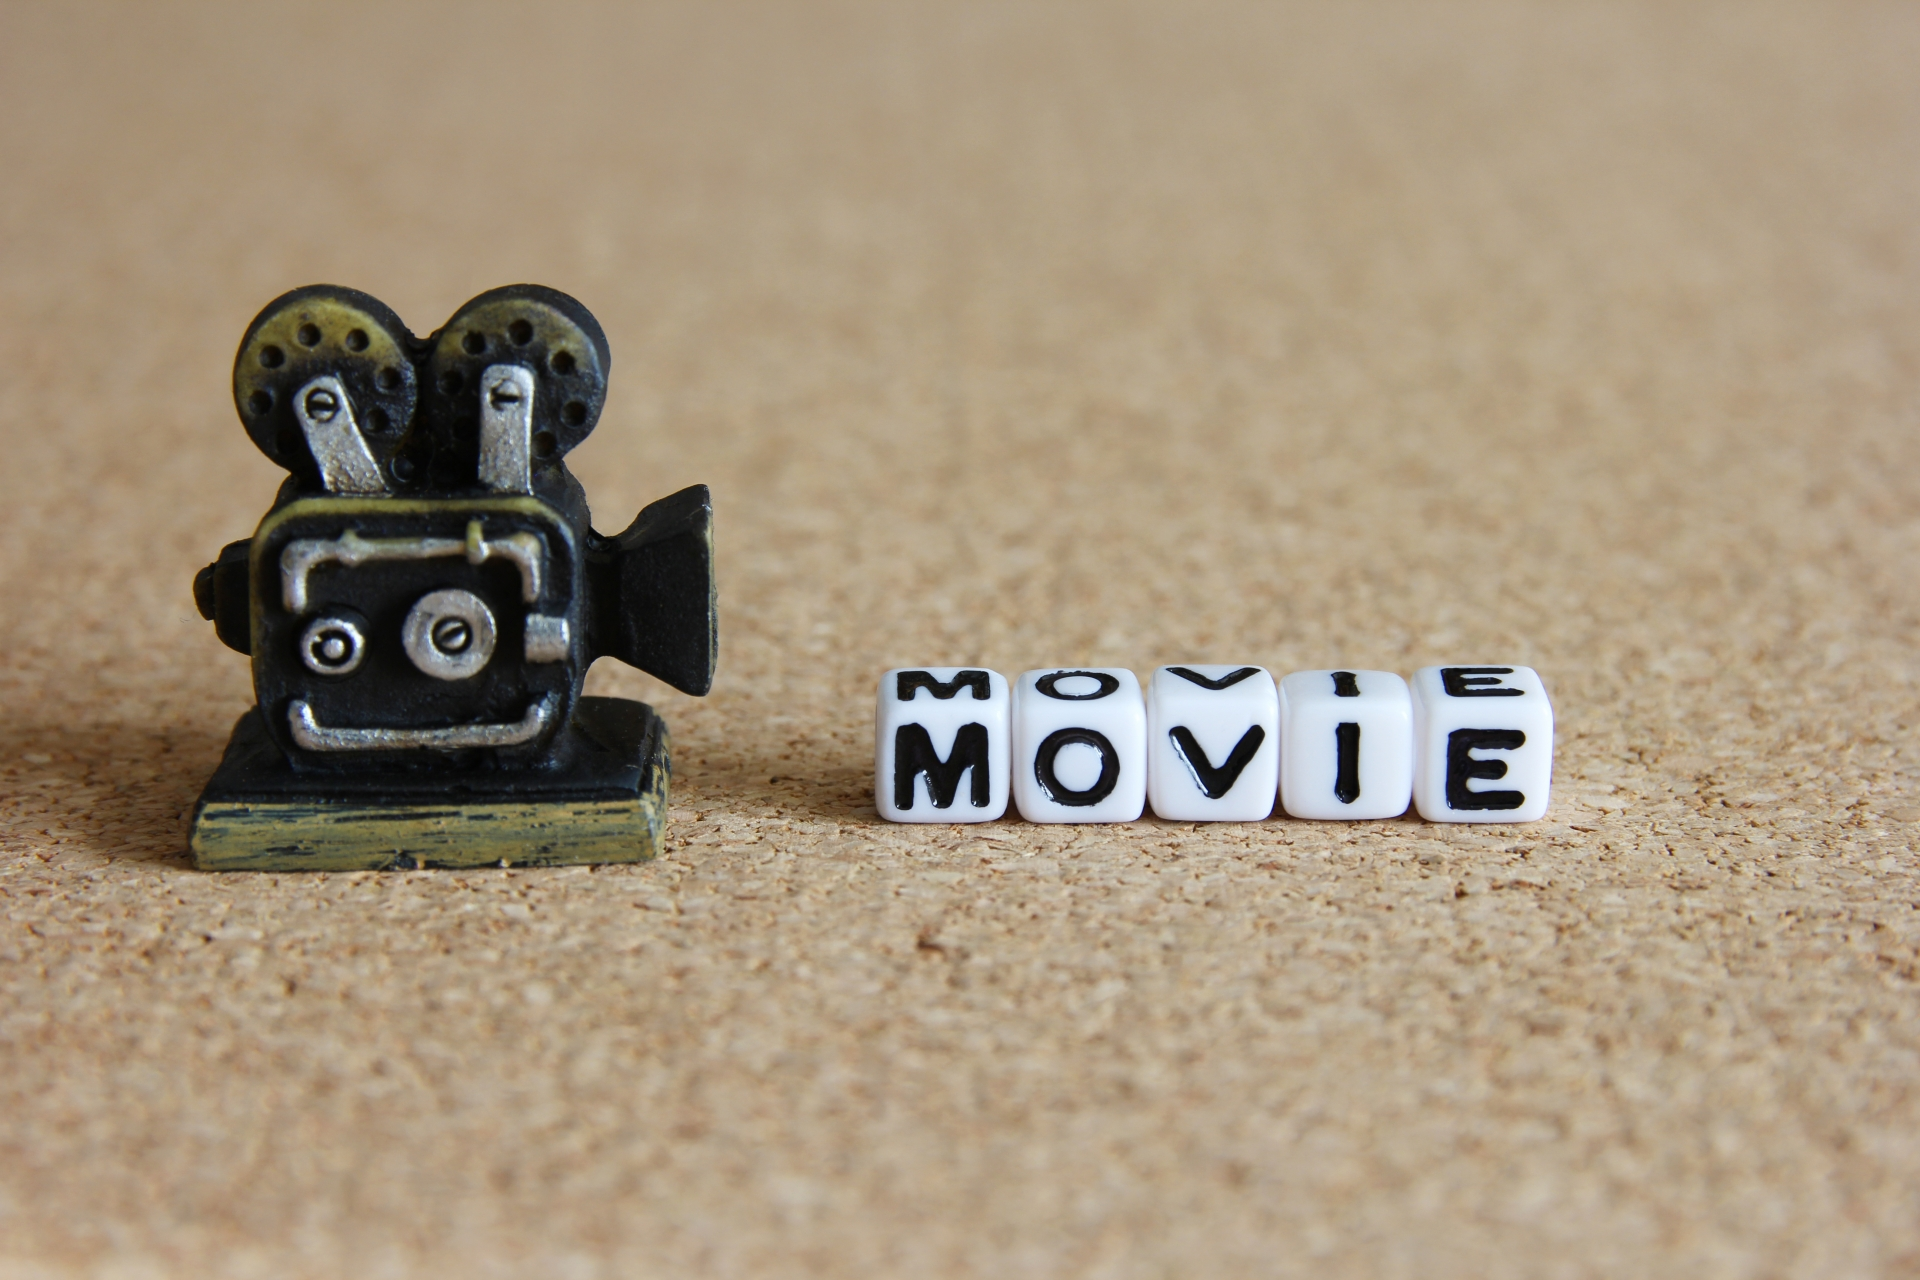 YouTube動画編集技術を学ぶならMovie Hucks!目指せ在宅クリエイター